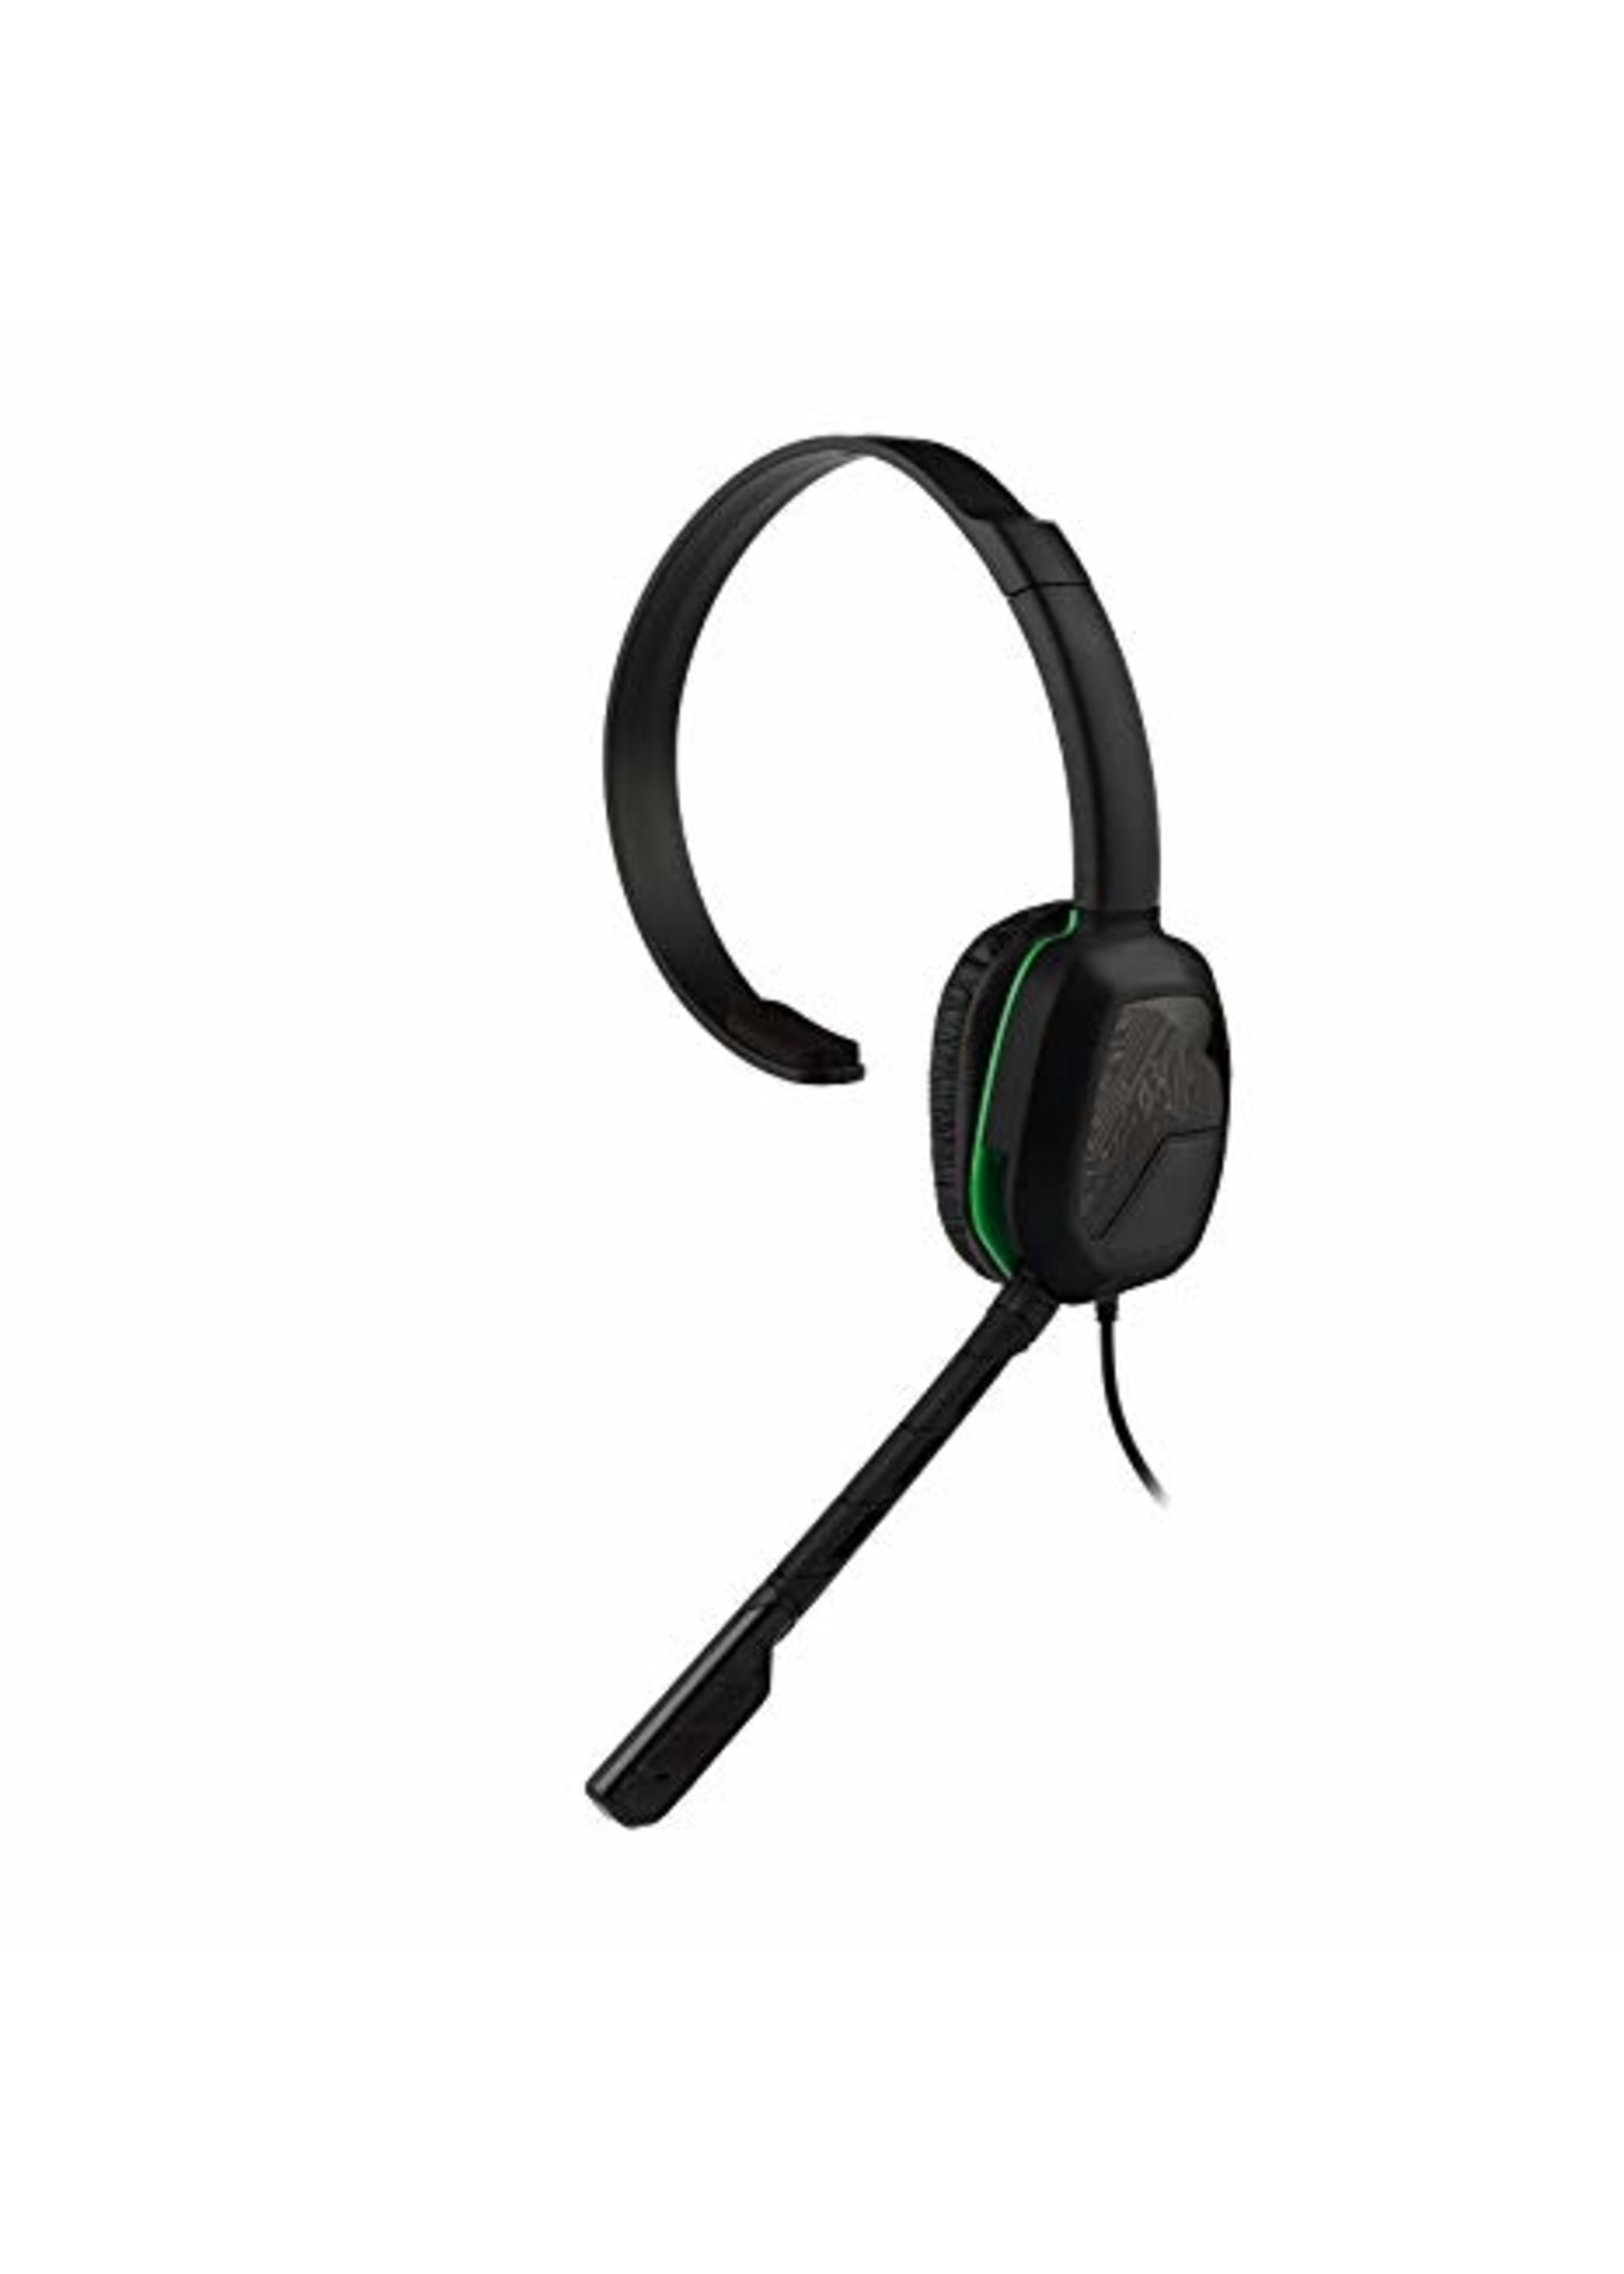 XBOne Chat LVL 1 Headset